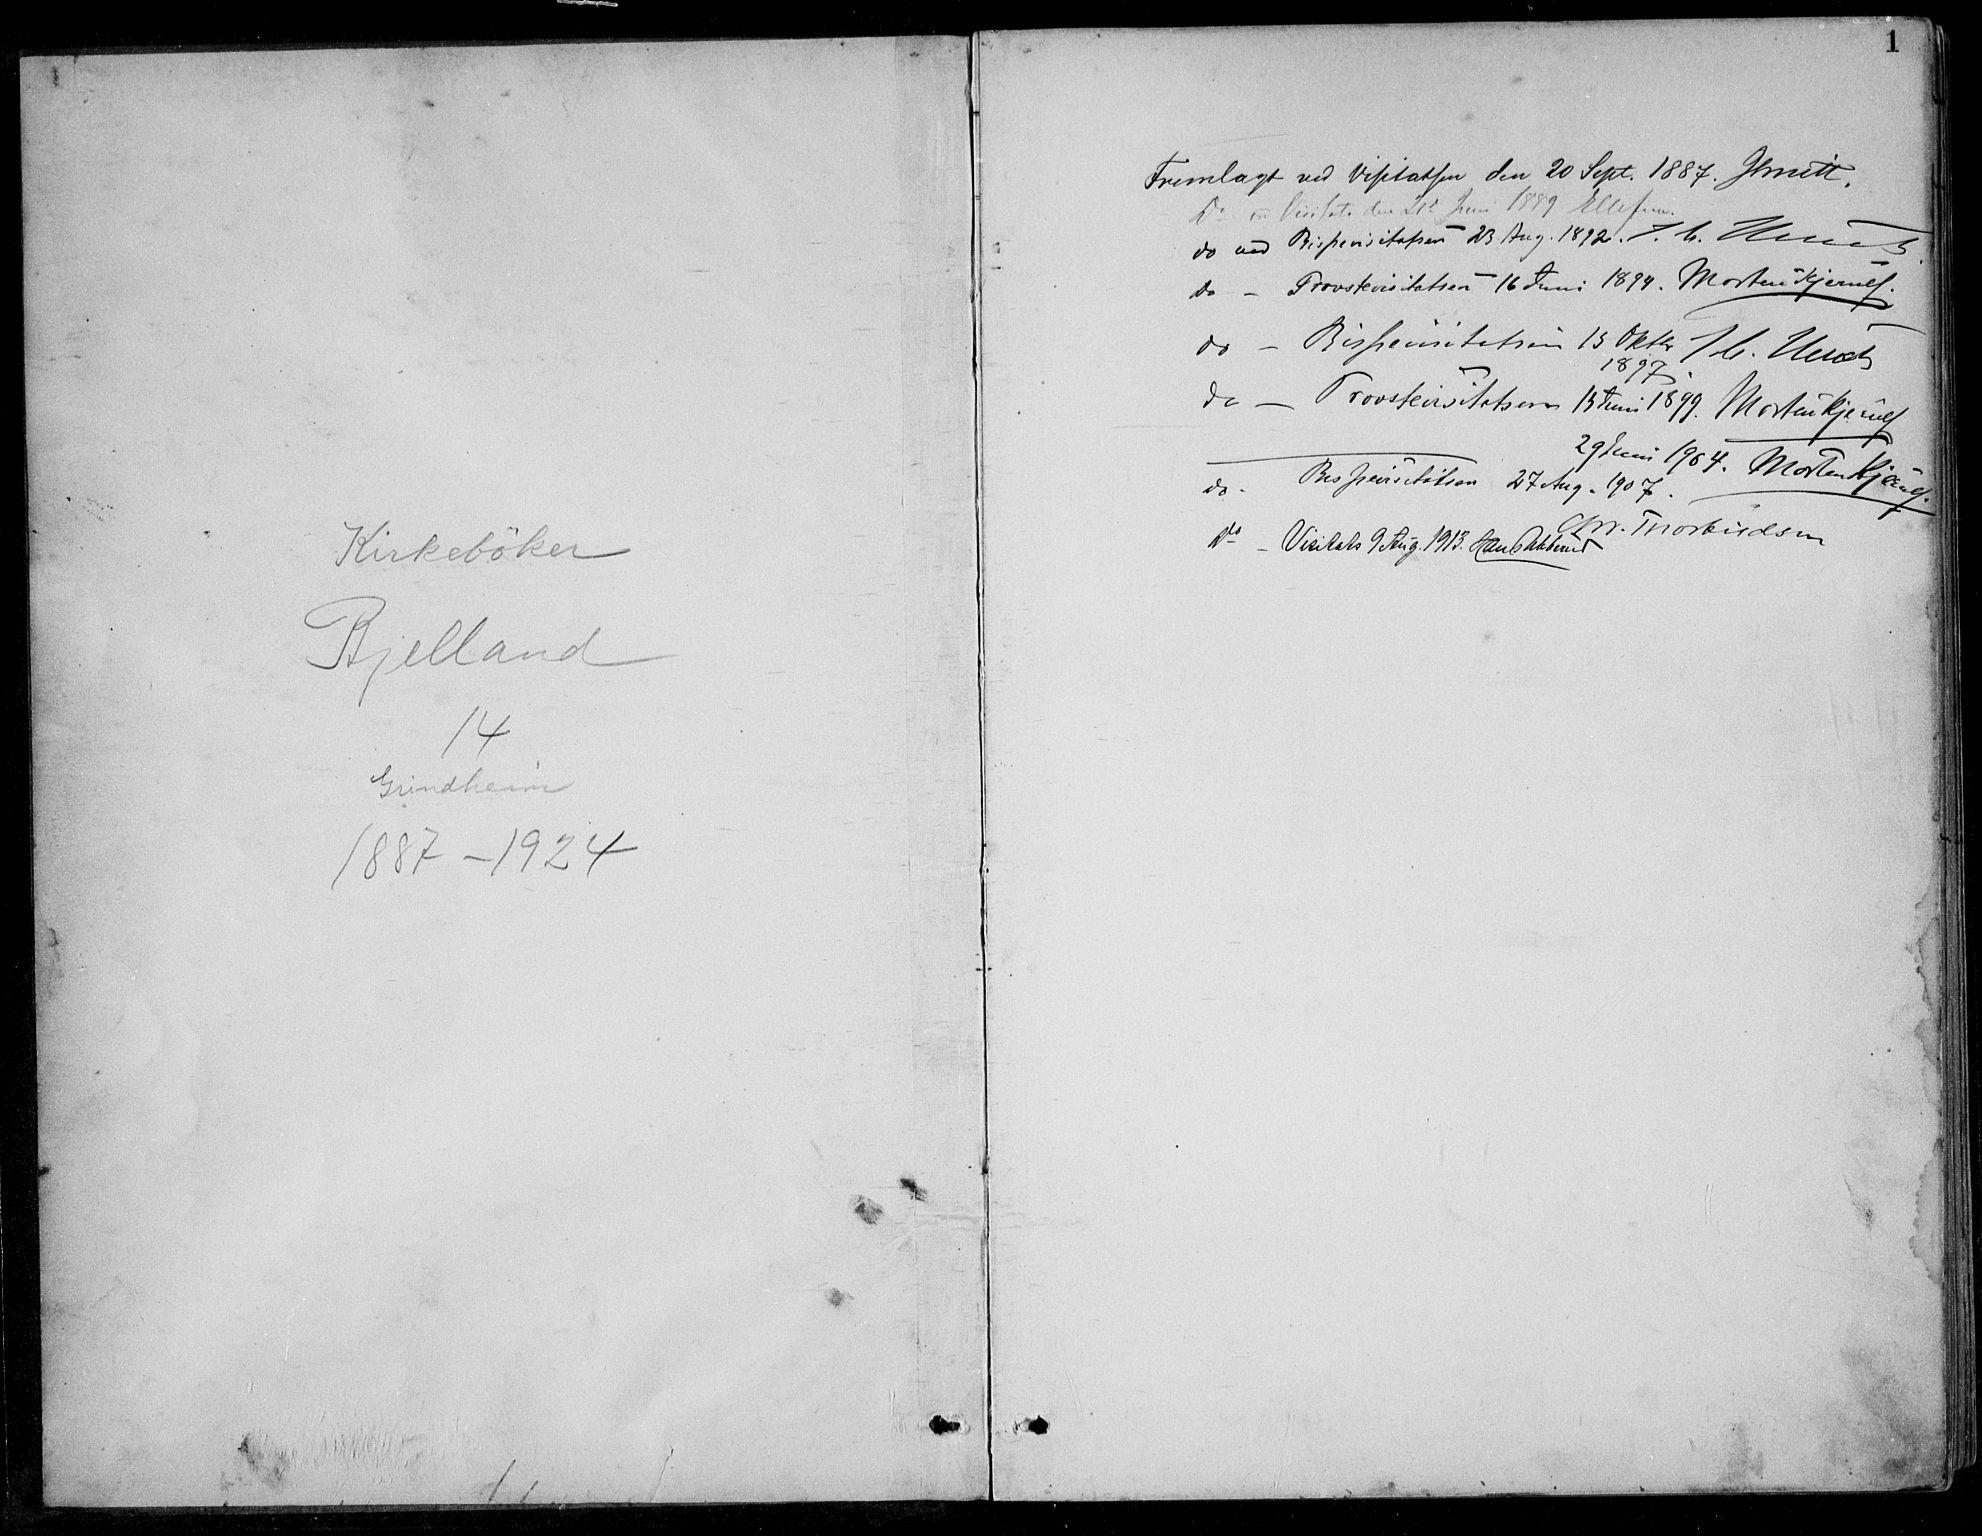 SAK, Bjelland sokneprestkontor, F/Fb/Fbc/L0003: Klokkerbok nr. B 3, 1887-1924, s. 1